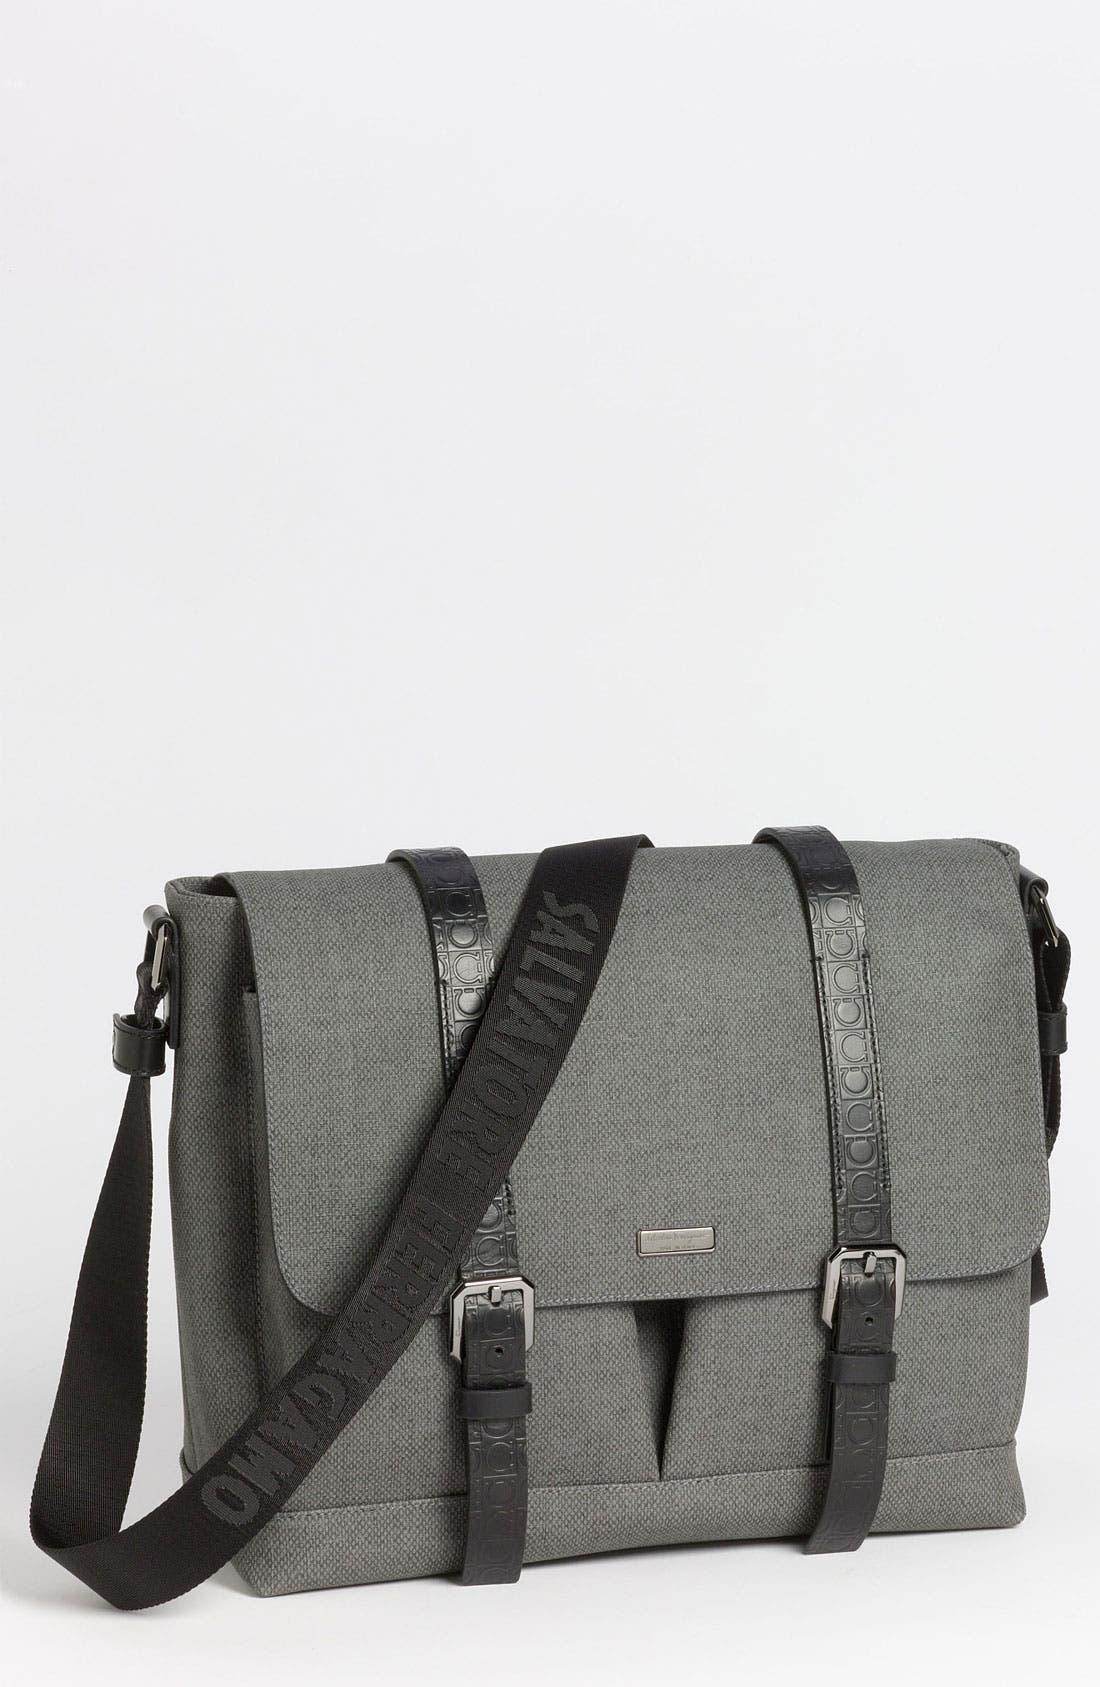 Alternate Image 1 Selected - Salvatore Ferragamo 'New Form' Messenger Bag